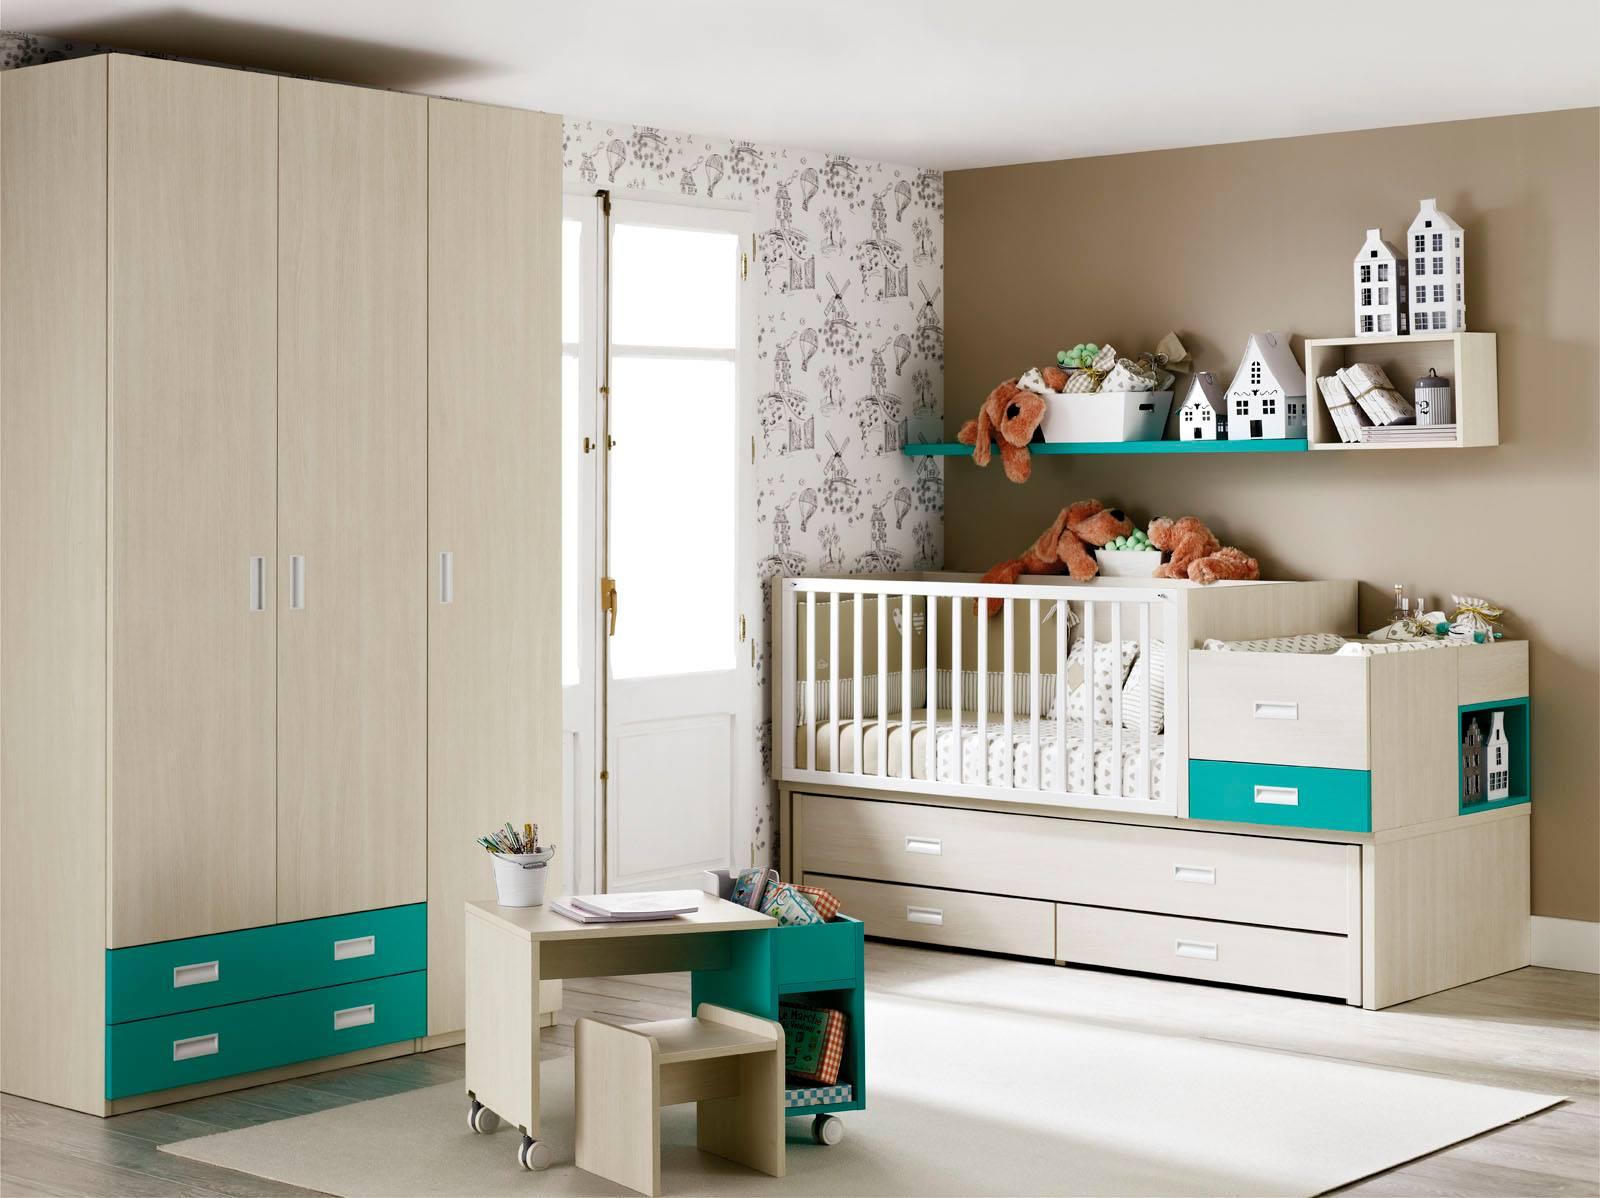 Muebles puericultura 2rmobel l 39 hospitalet mueble juvenil e infantil - Muebles hospitalet de llobregat ...